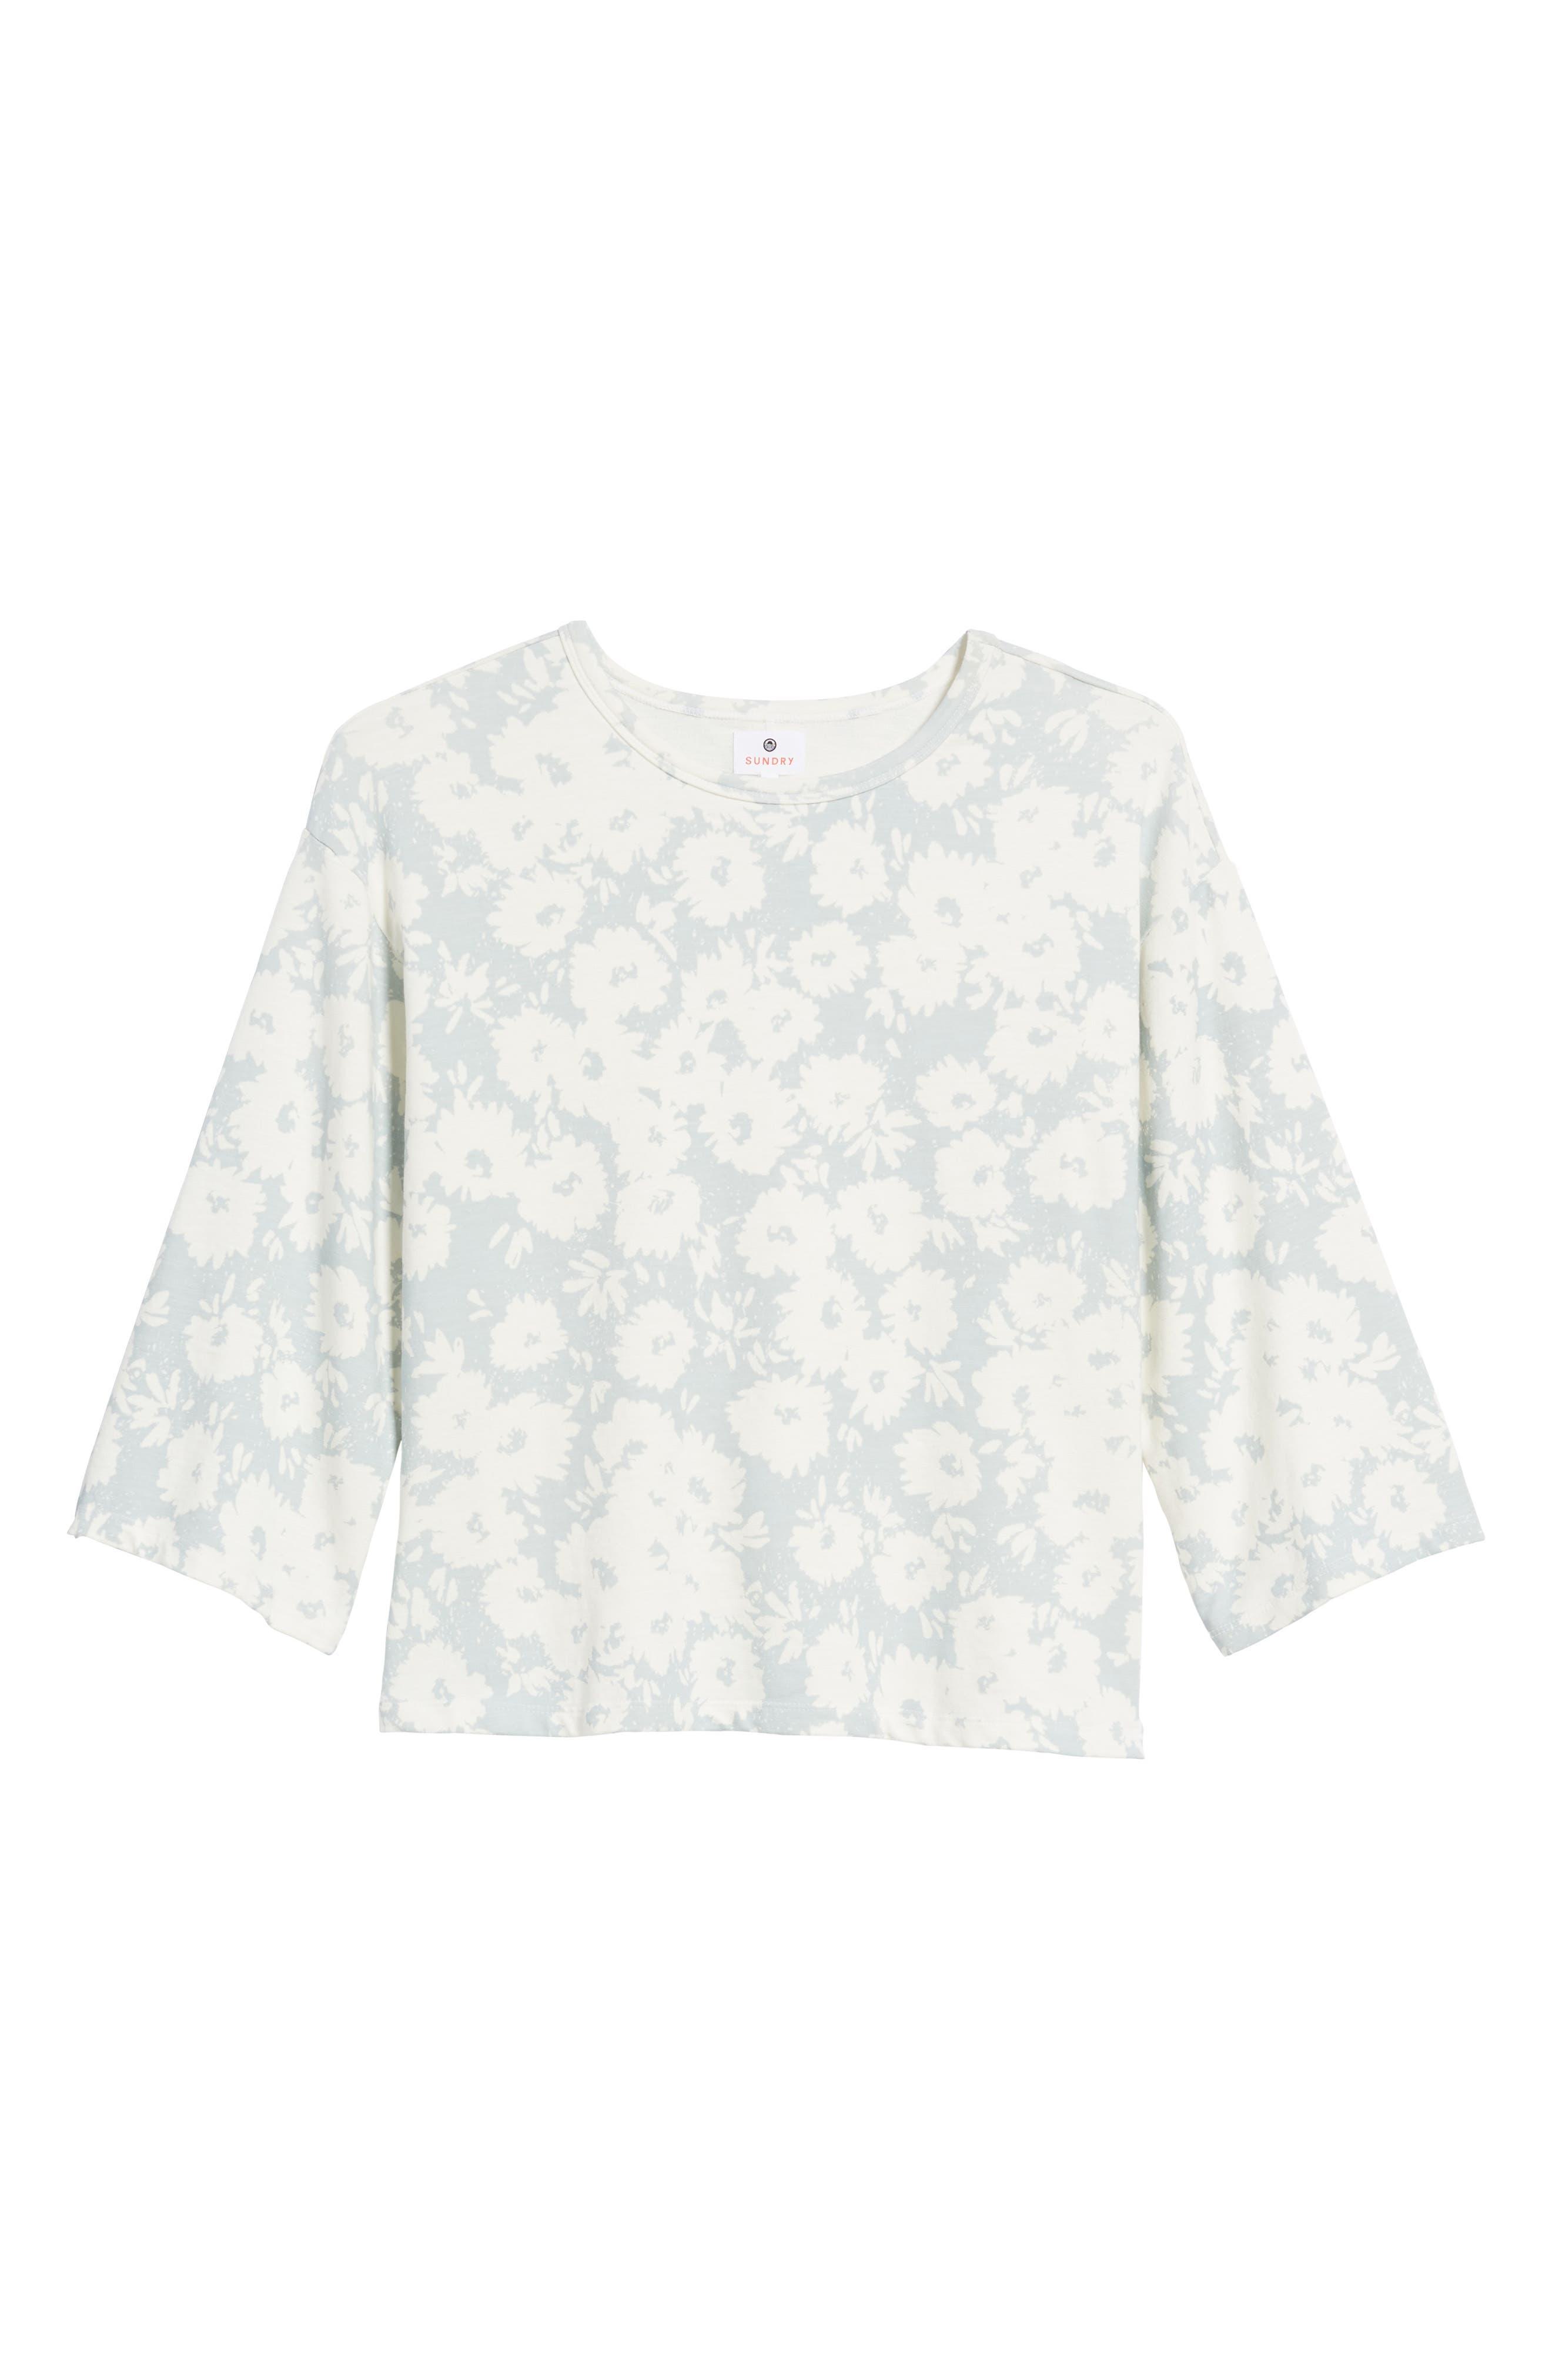 Kimono Sweatshirt,                             Alternate thumbnail 7, color,                             Sky/ White